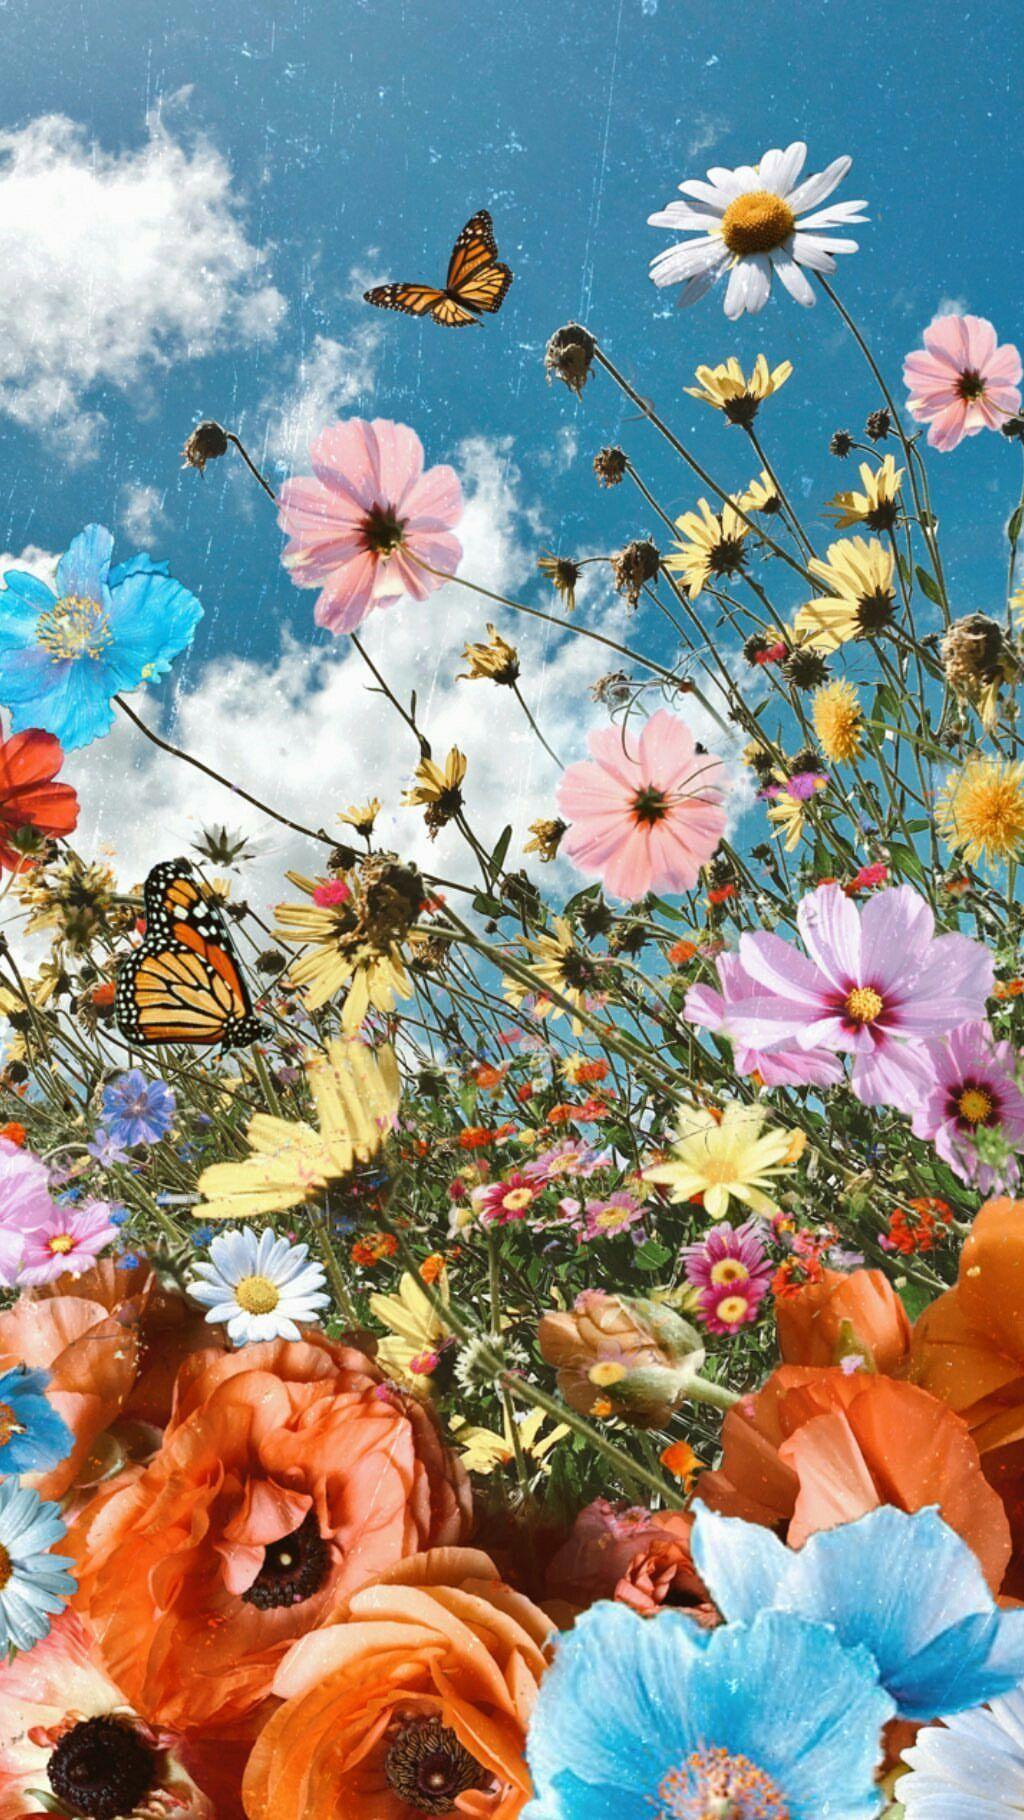 #flower #flowers #plants #botanical #floral #beautiful #wallpaper #bac